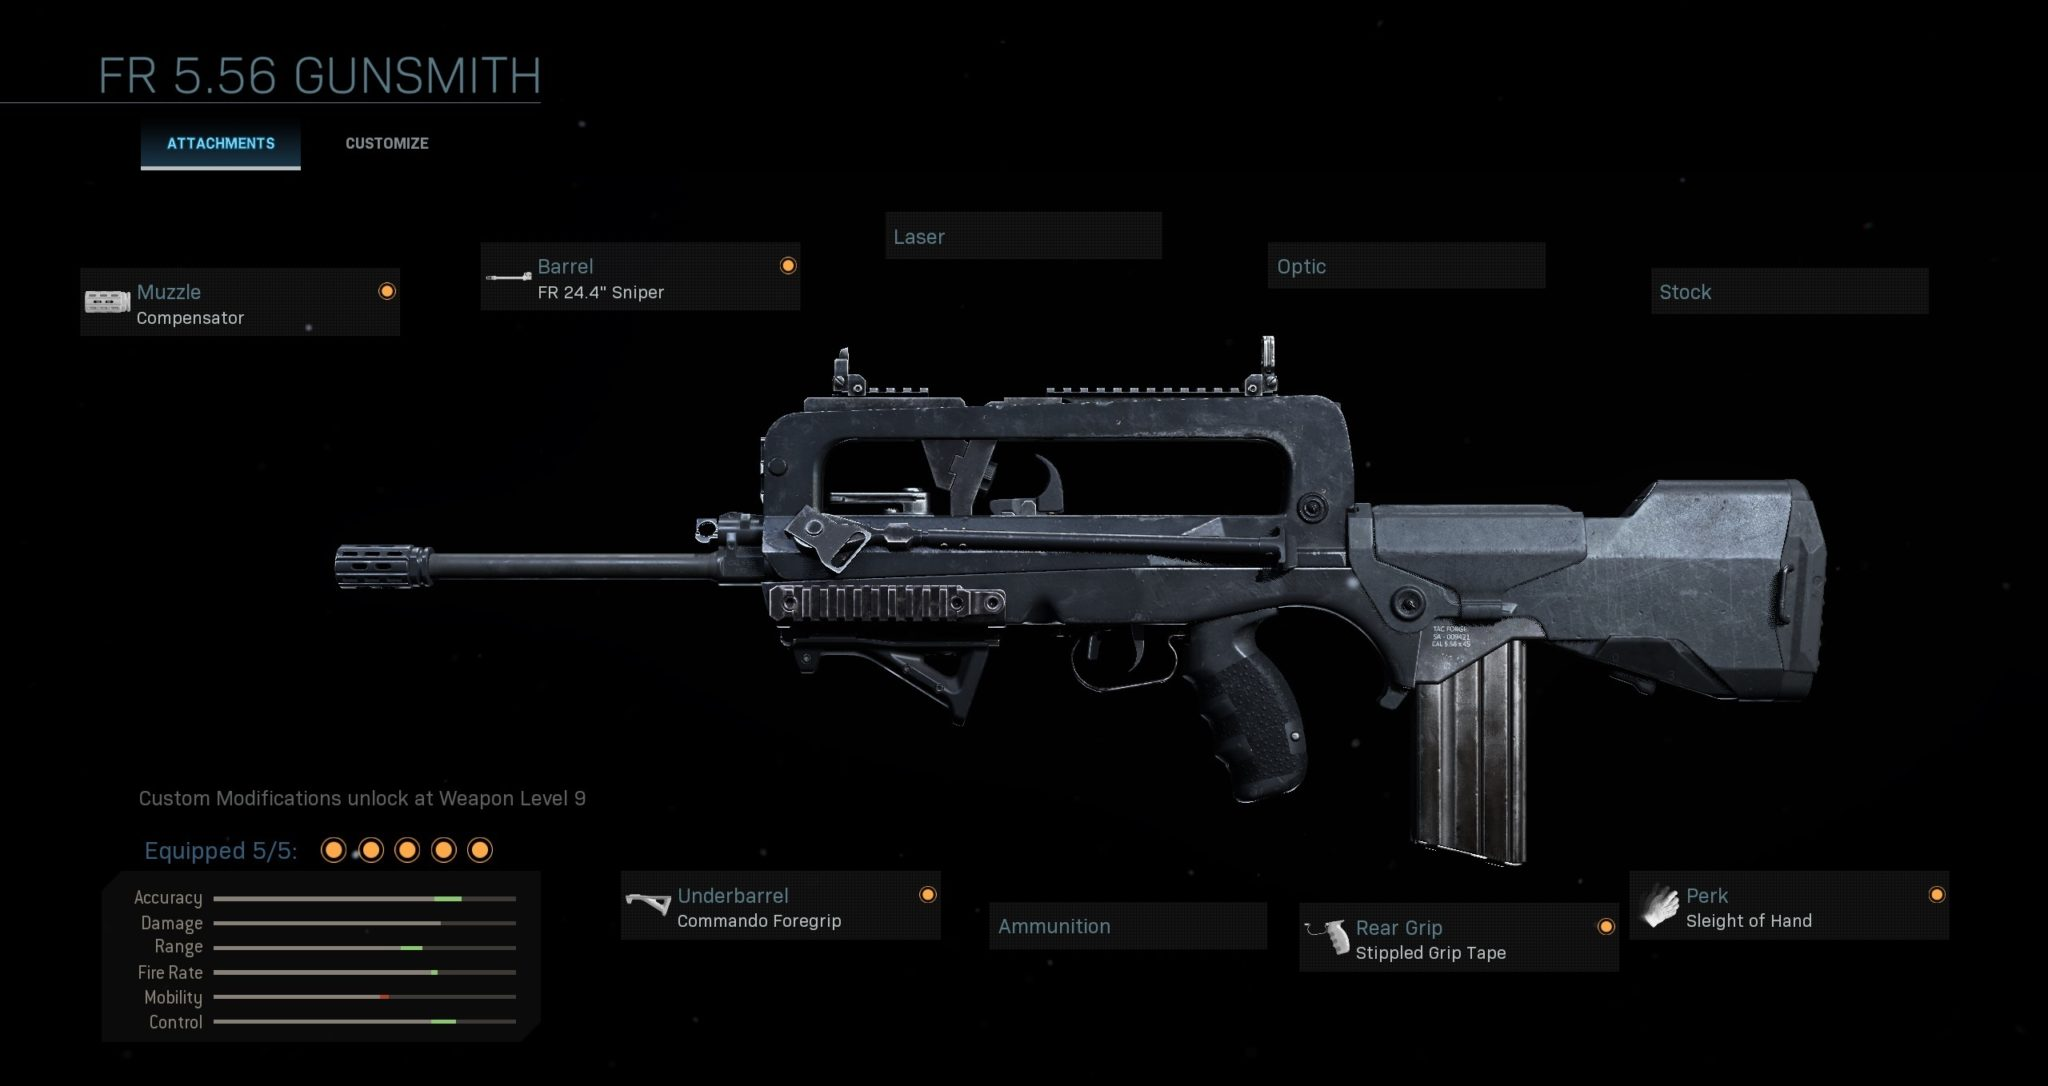 FR.56 multiplayer